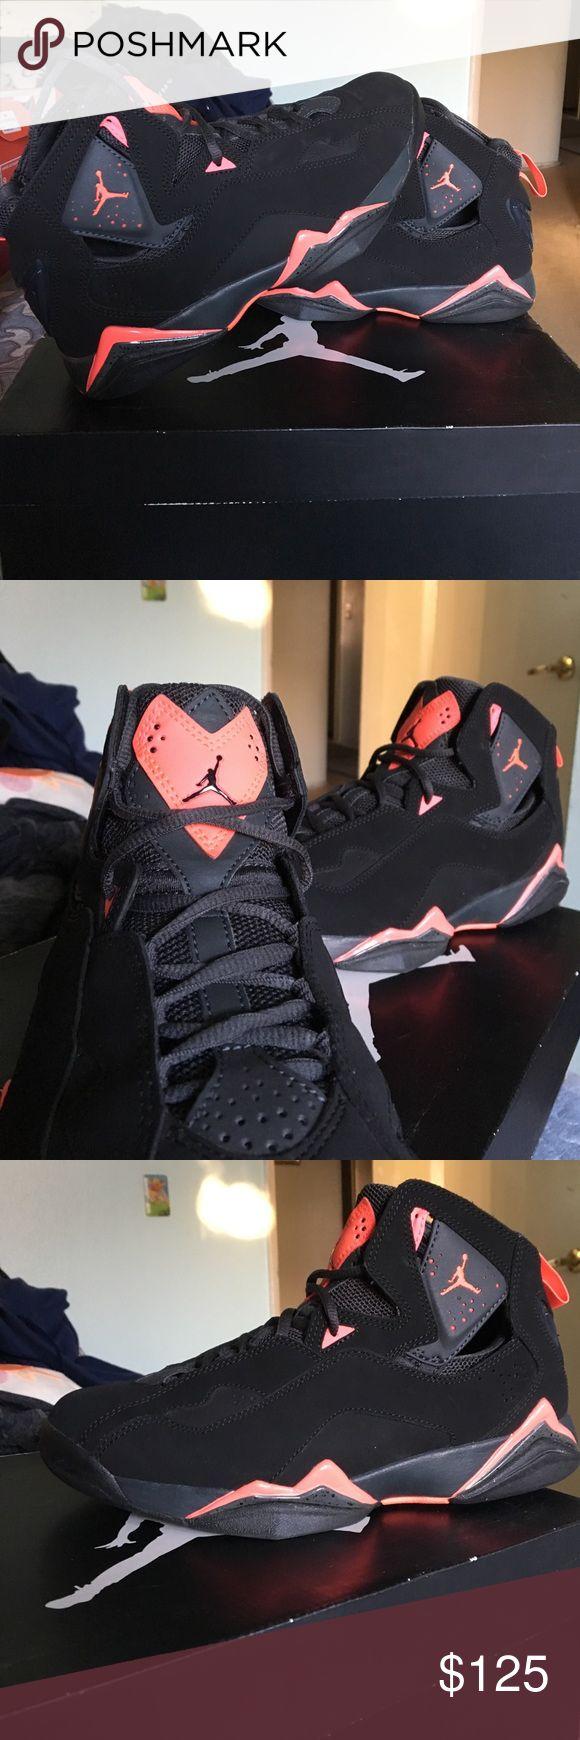 Jordan True Flight PINK NEON COLOR. Very comfortable. Worn 2 times. Jordan Shoes Sneakers